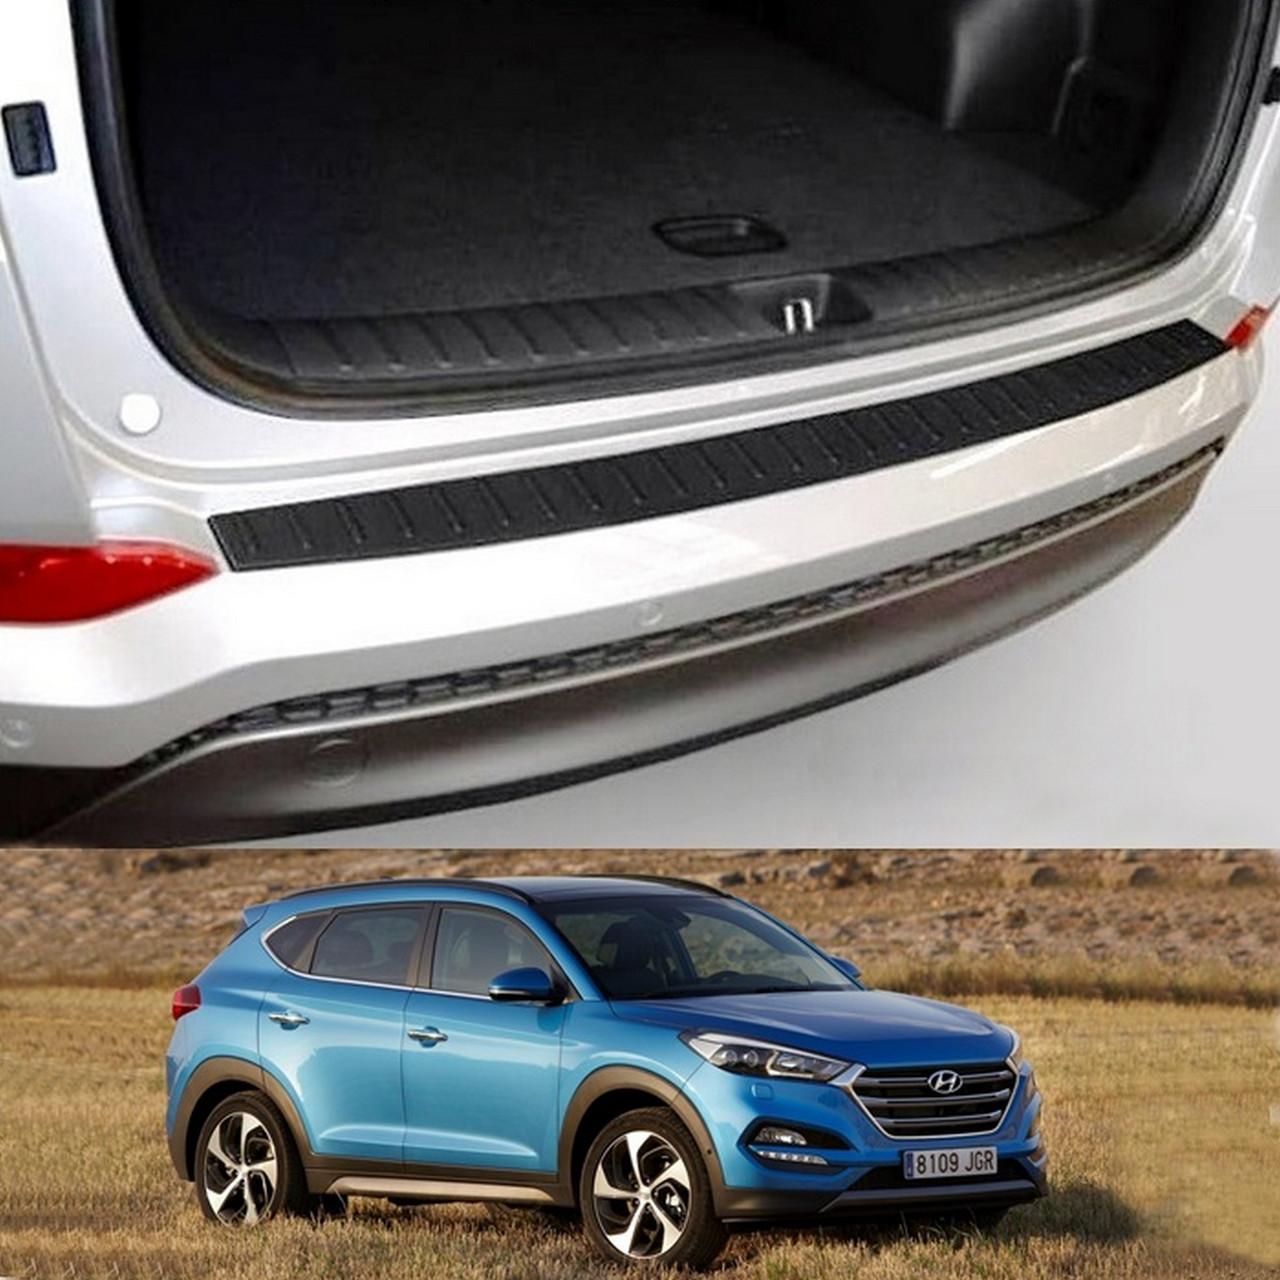 Пластикова захисна накладка на задній бампер для Hyundai Tucson 2015-2018